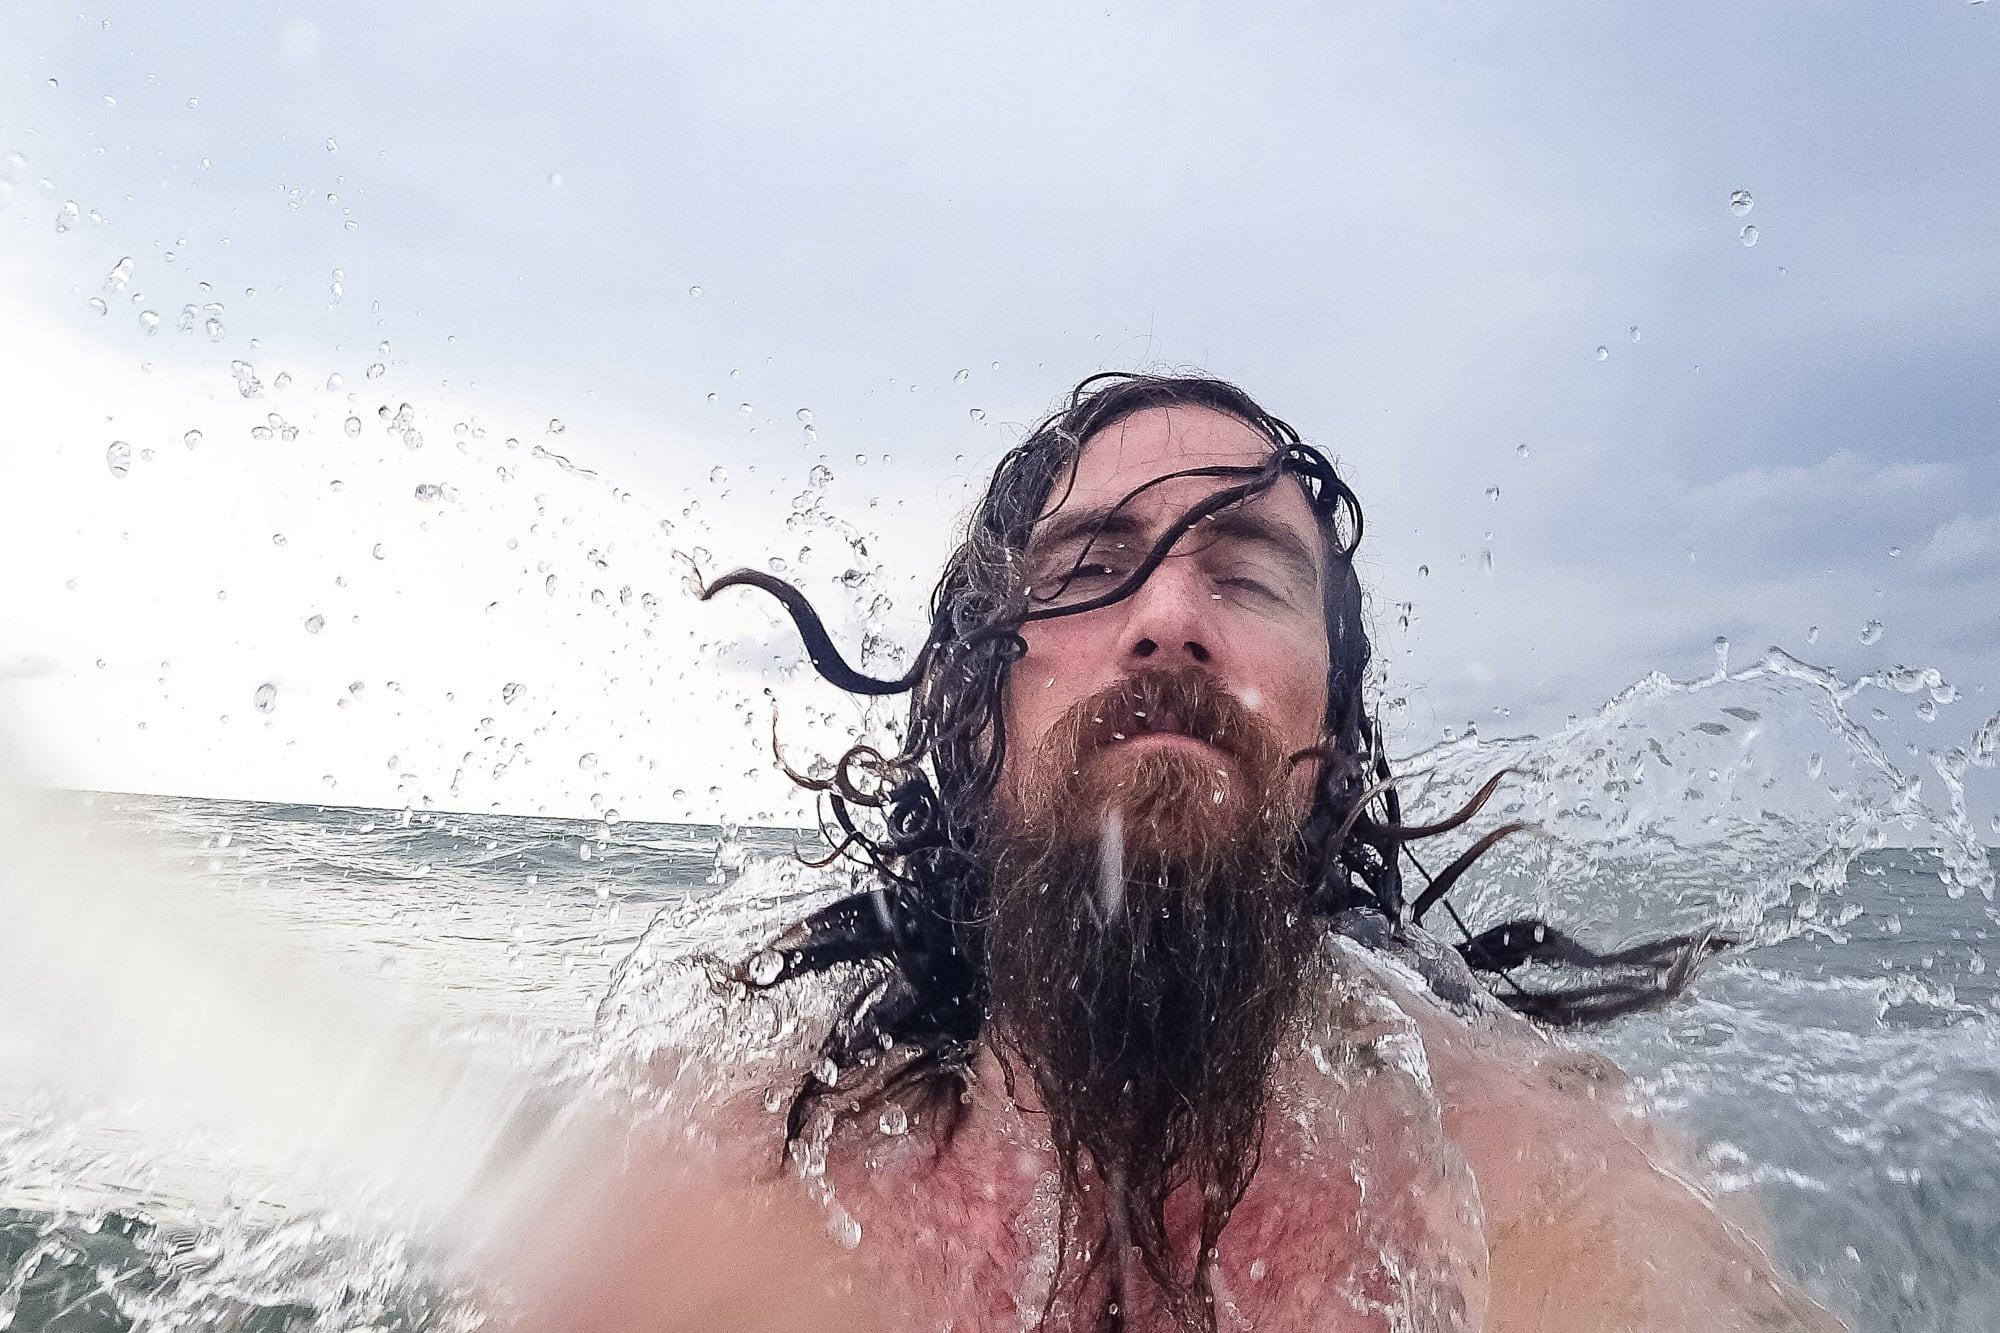 wave selfie 9